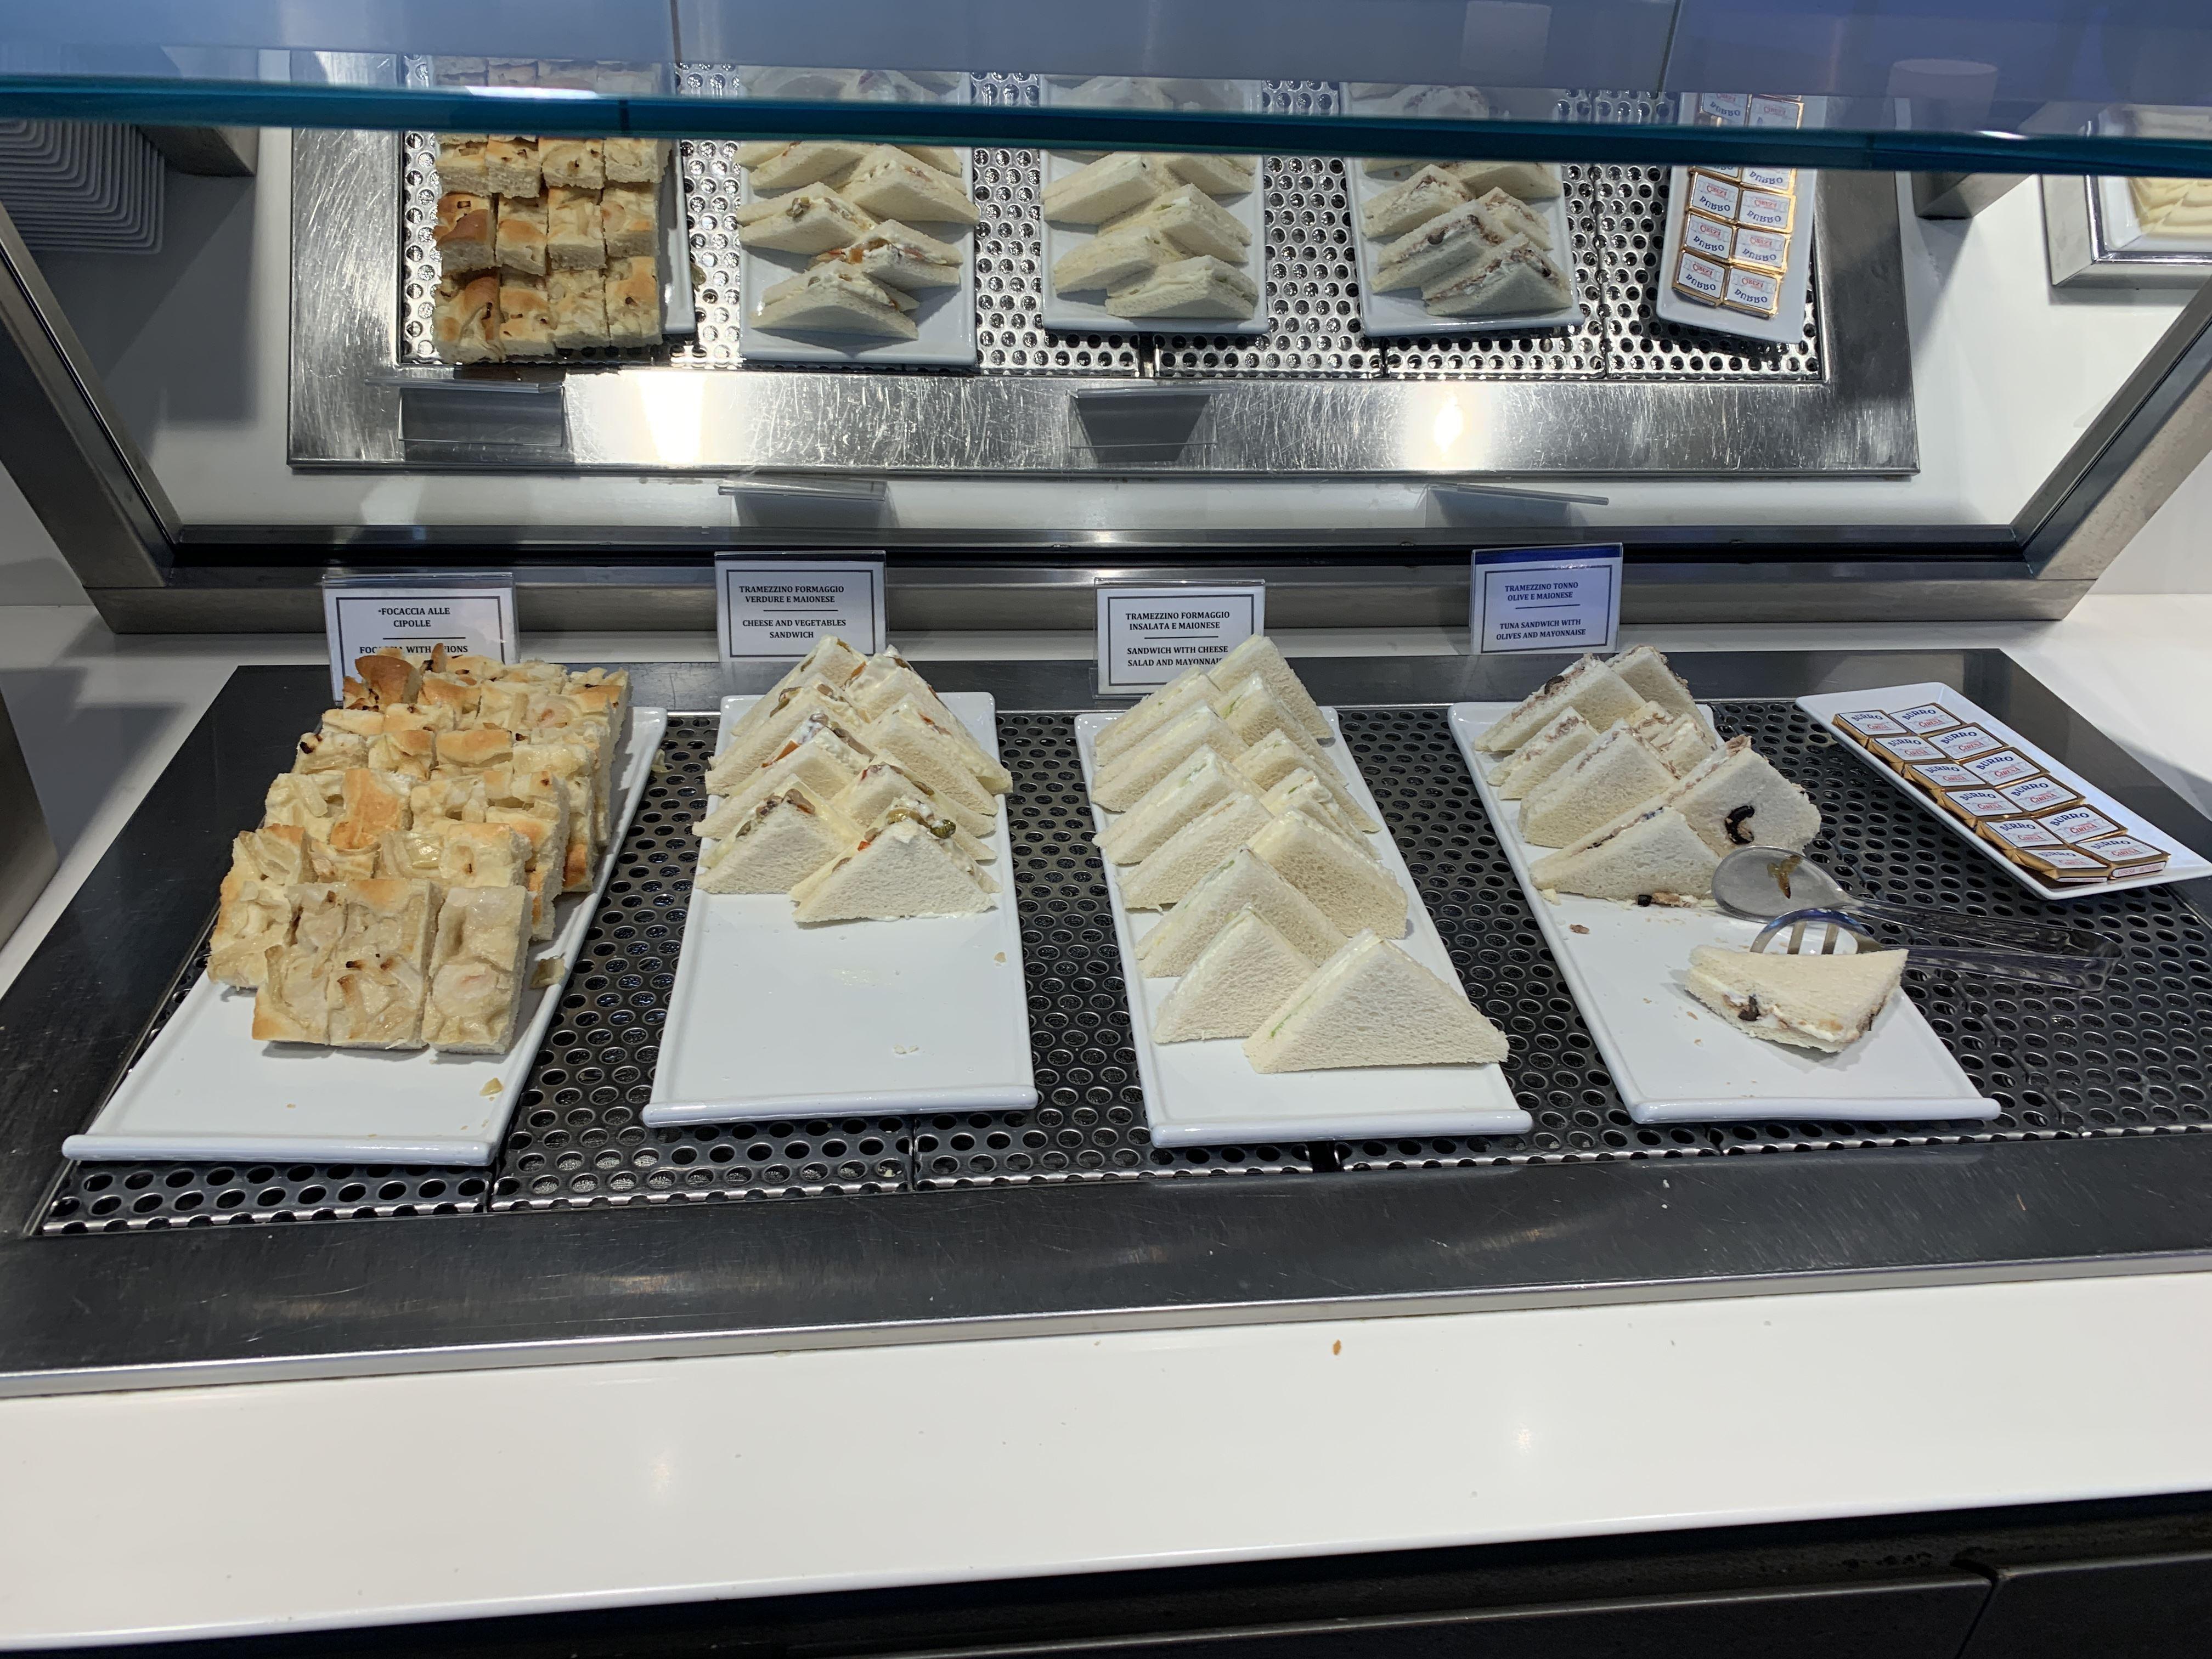 Priority Pass Lounge Malpensa Airport Terminal 1 Sala Montale Food